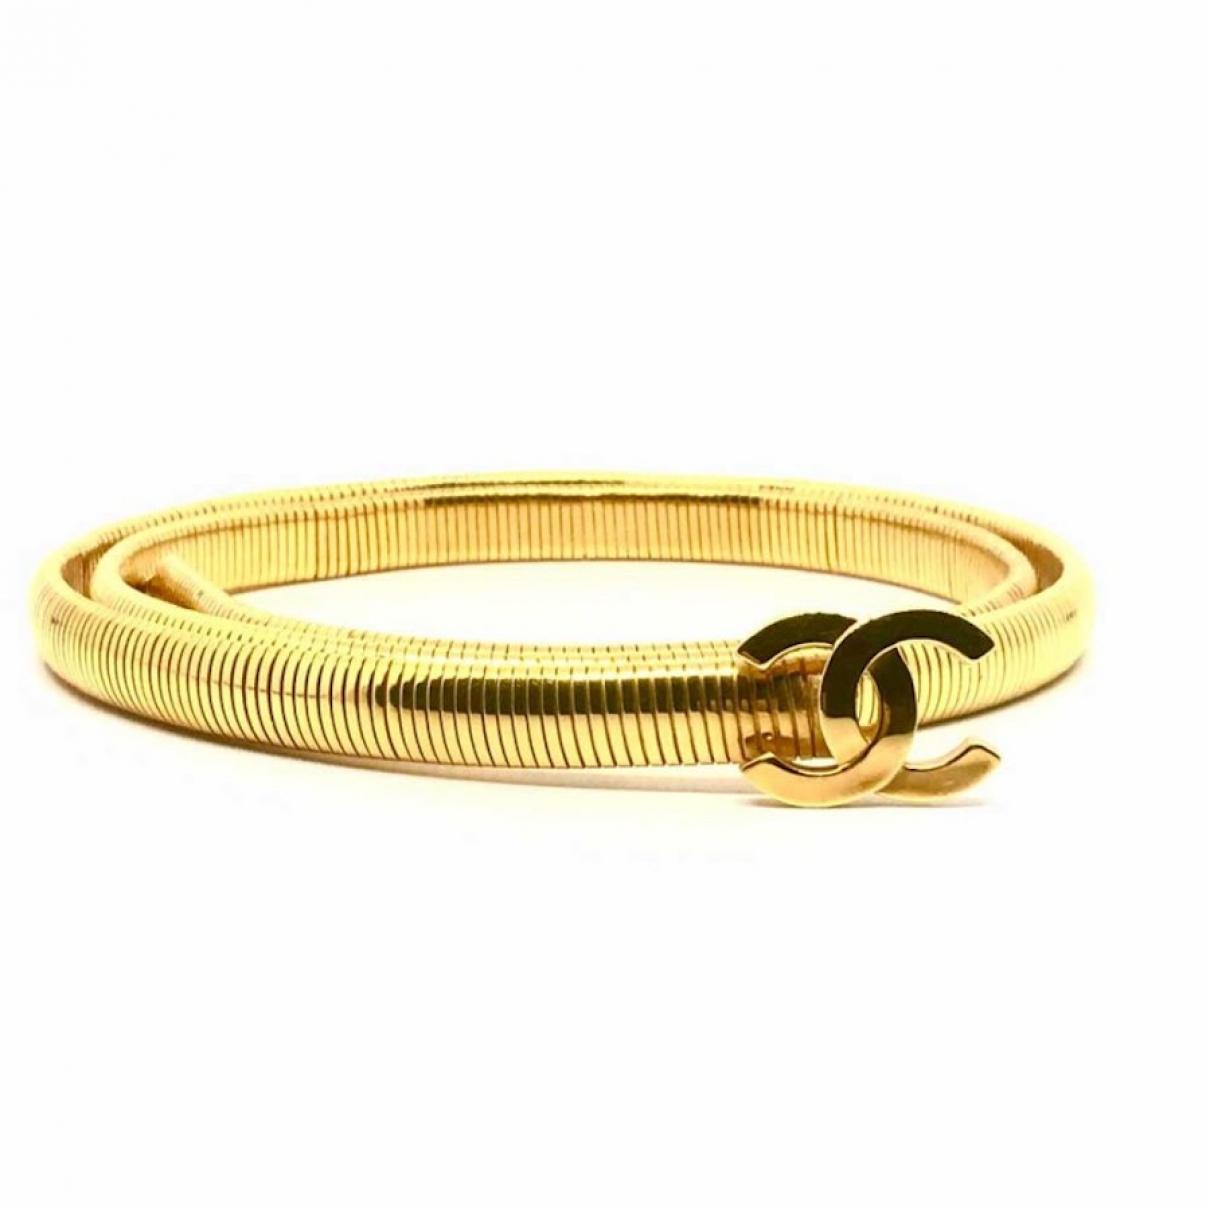 Chanel \N Gold Metal belt for Women XS International